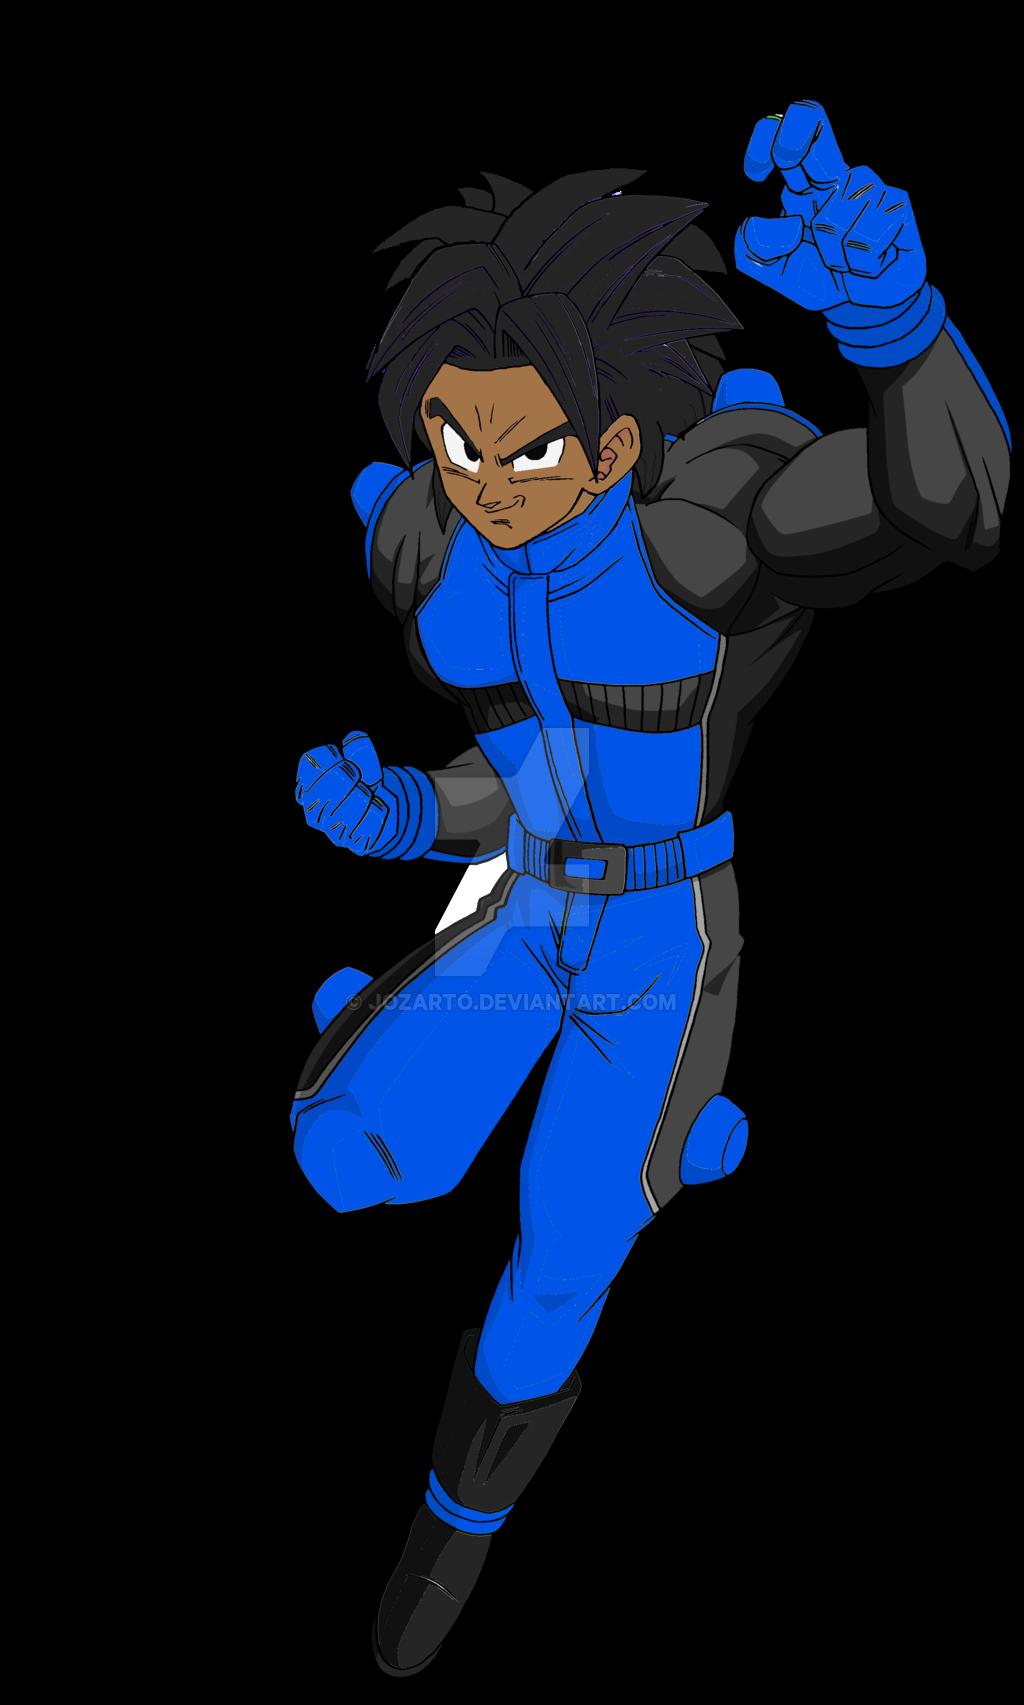 Marcuto (Battle Suit) by jozarto on DeviantArt.